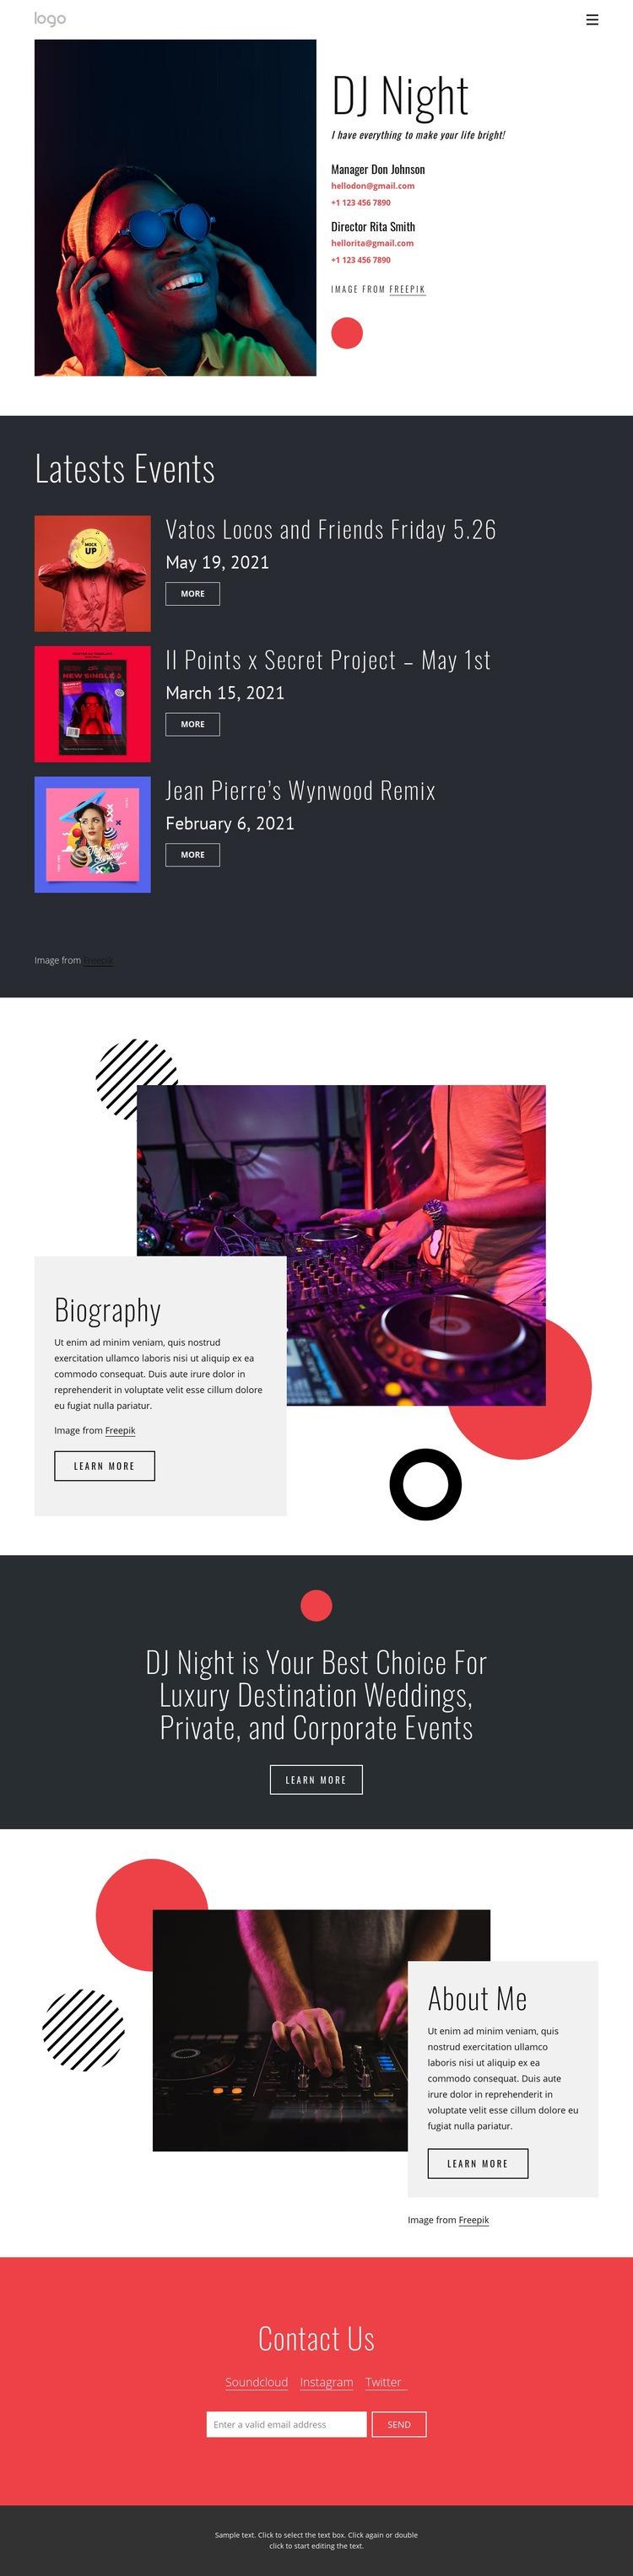 Dj night website Web Page Design